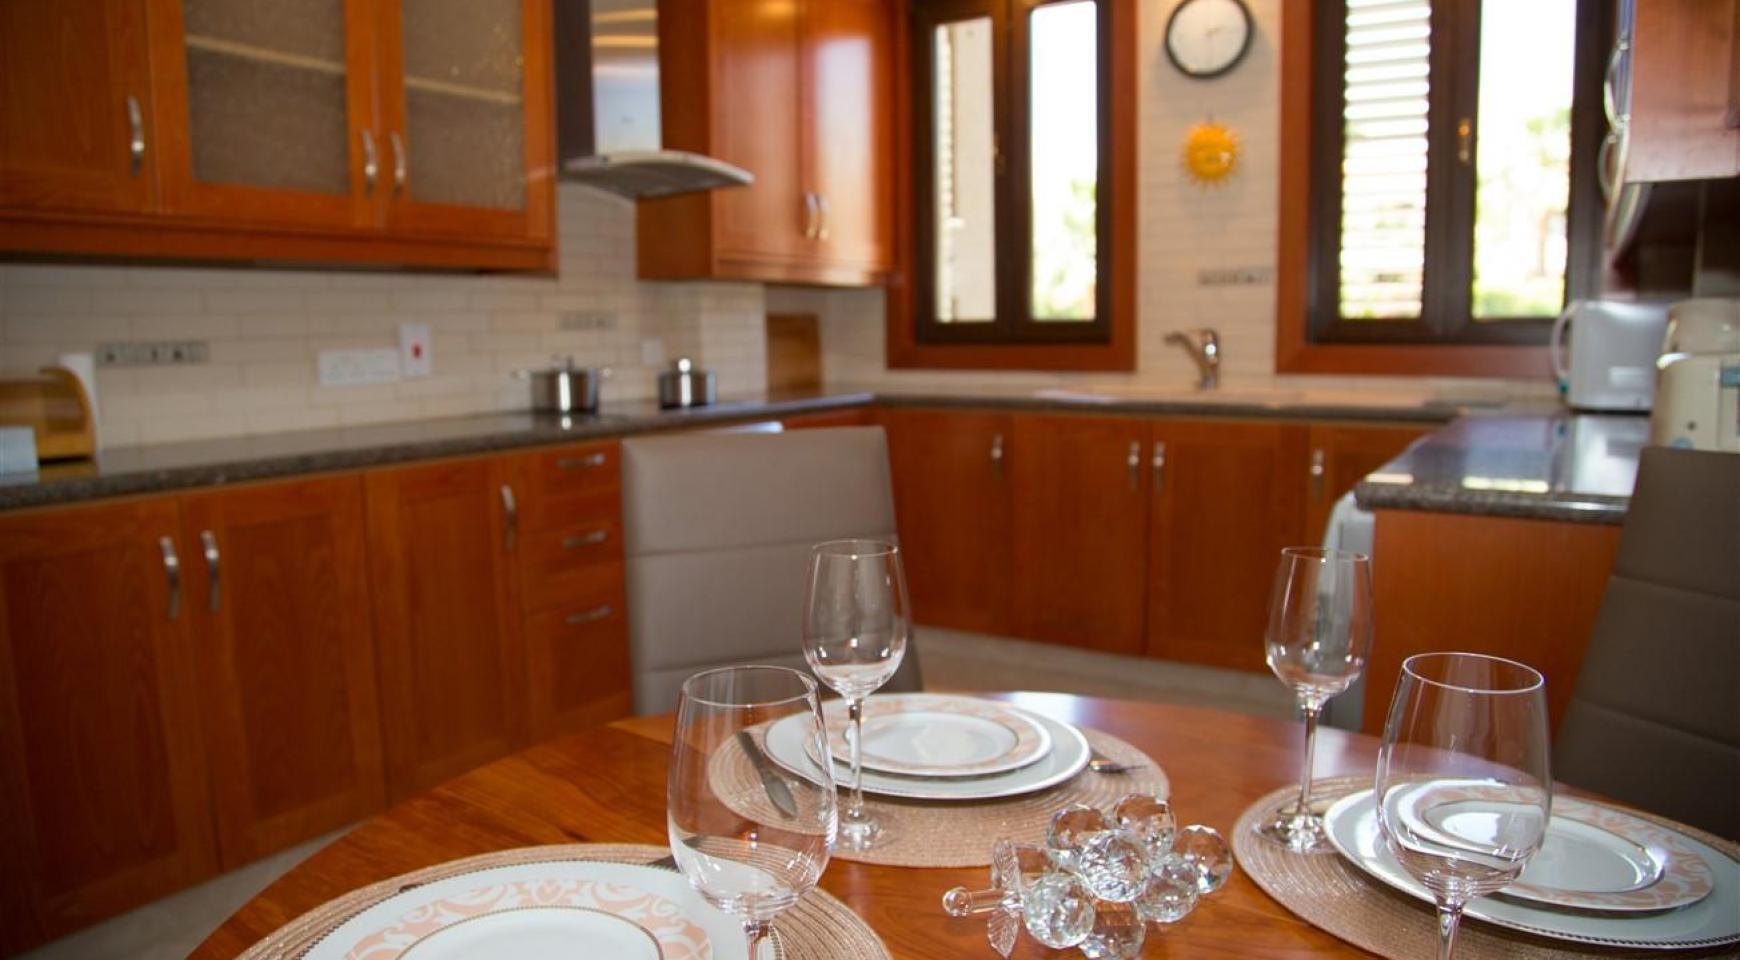 3-Спальная Квартира на Берегу Моря в Комплексе Thera   - 26